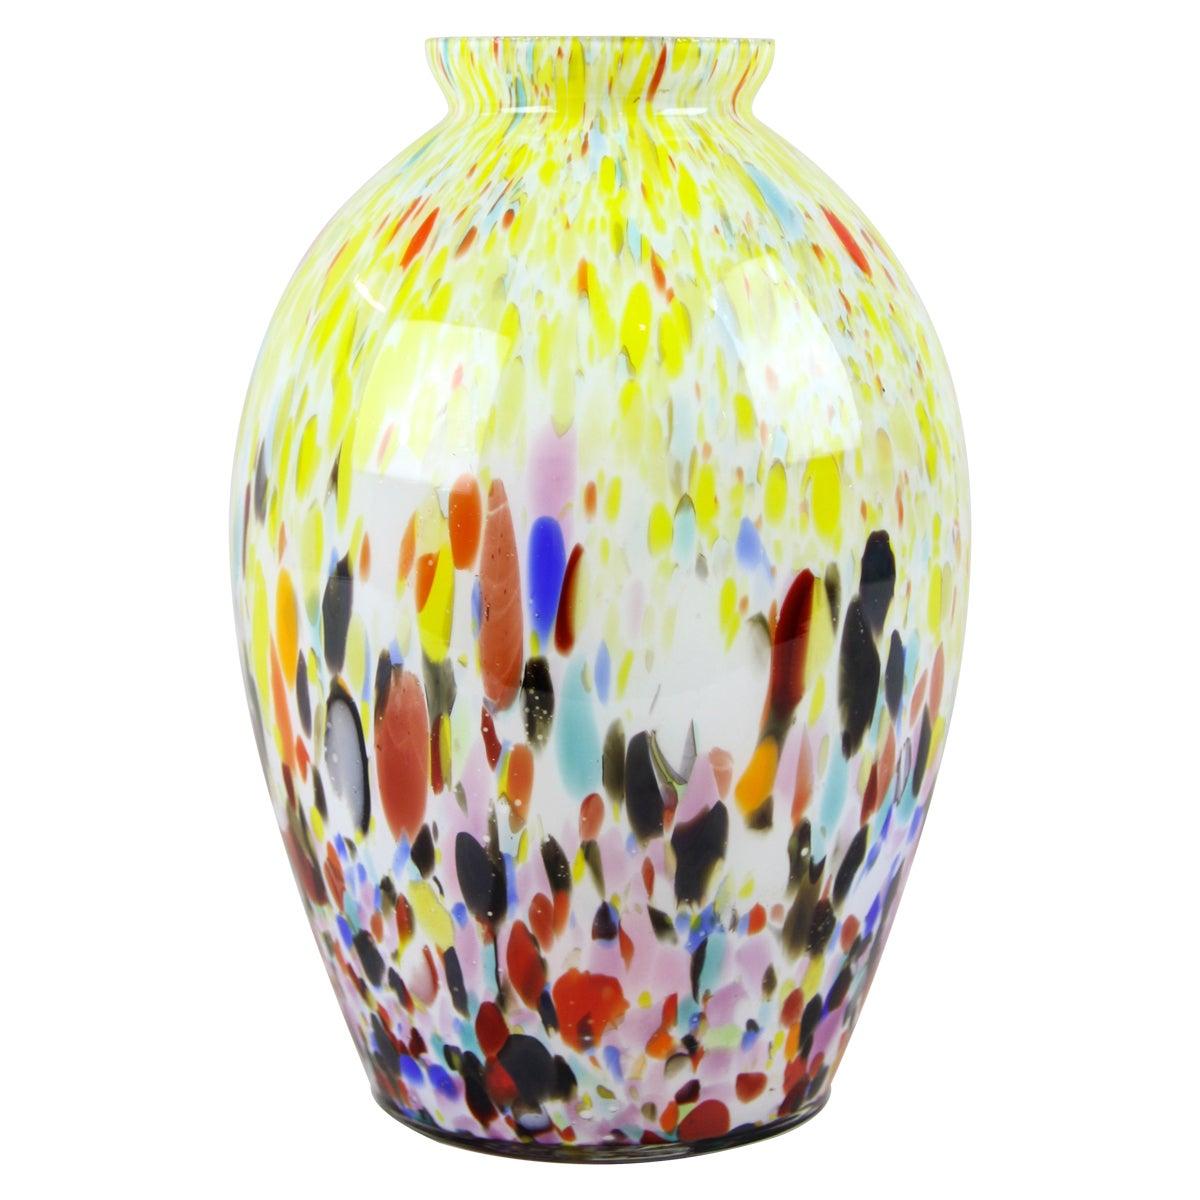 Murano Glass Vase Midcentury Multicolored, Italy, circa 1960